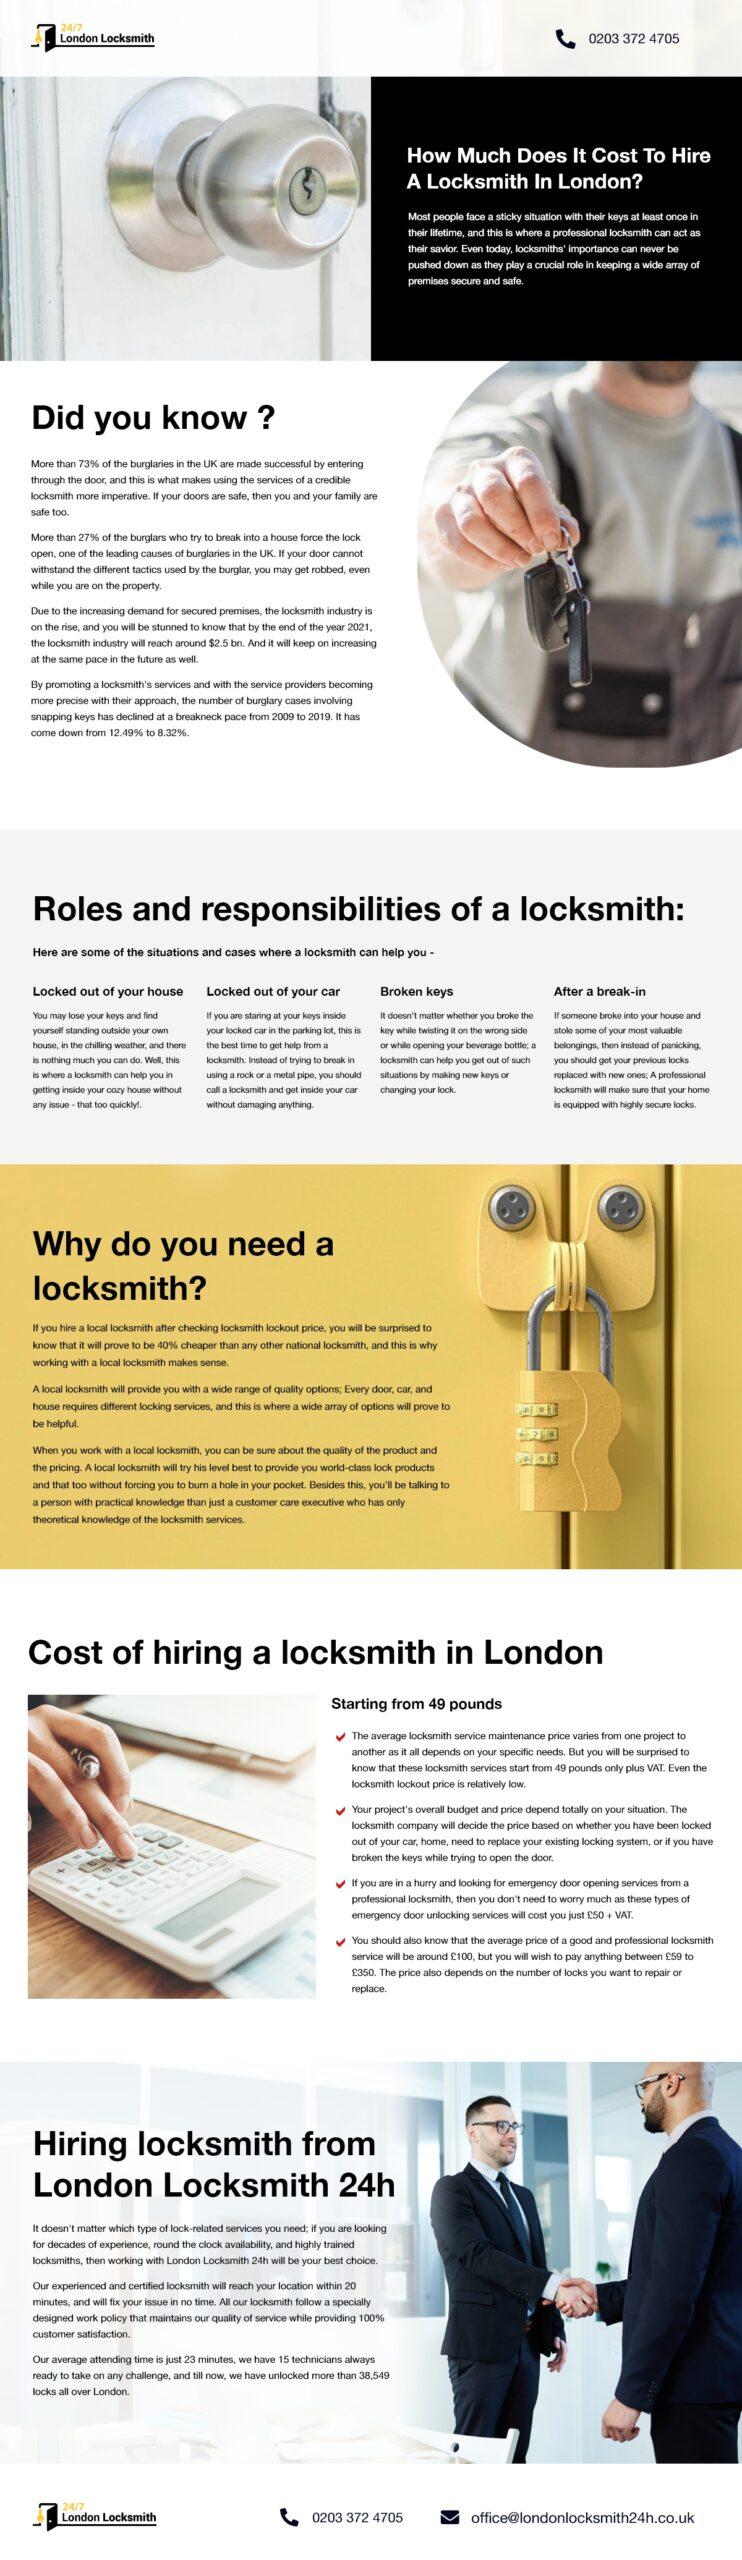 Cost-Of-Hiring-A-Locksmith